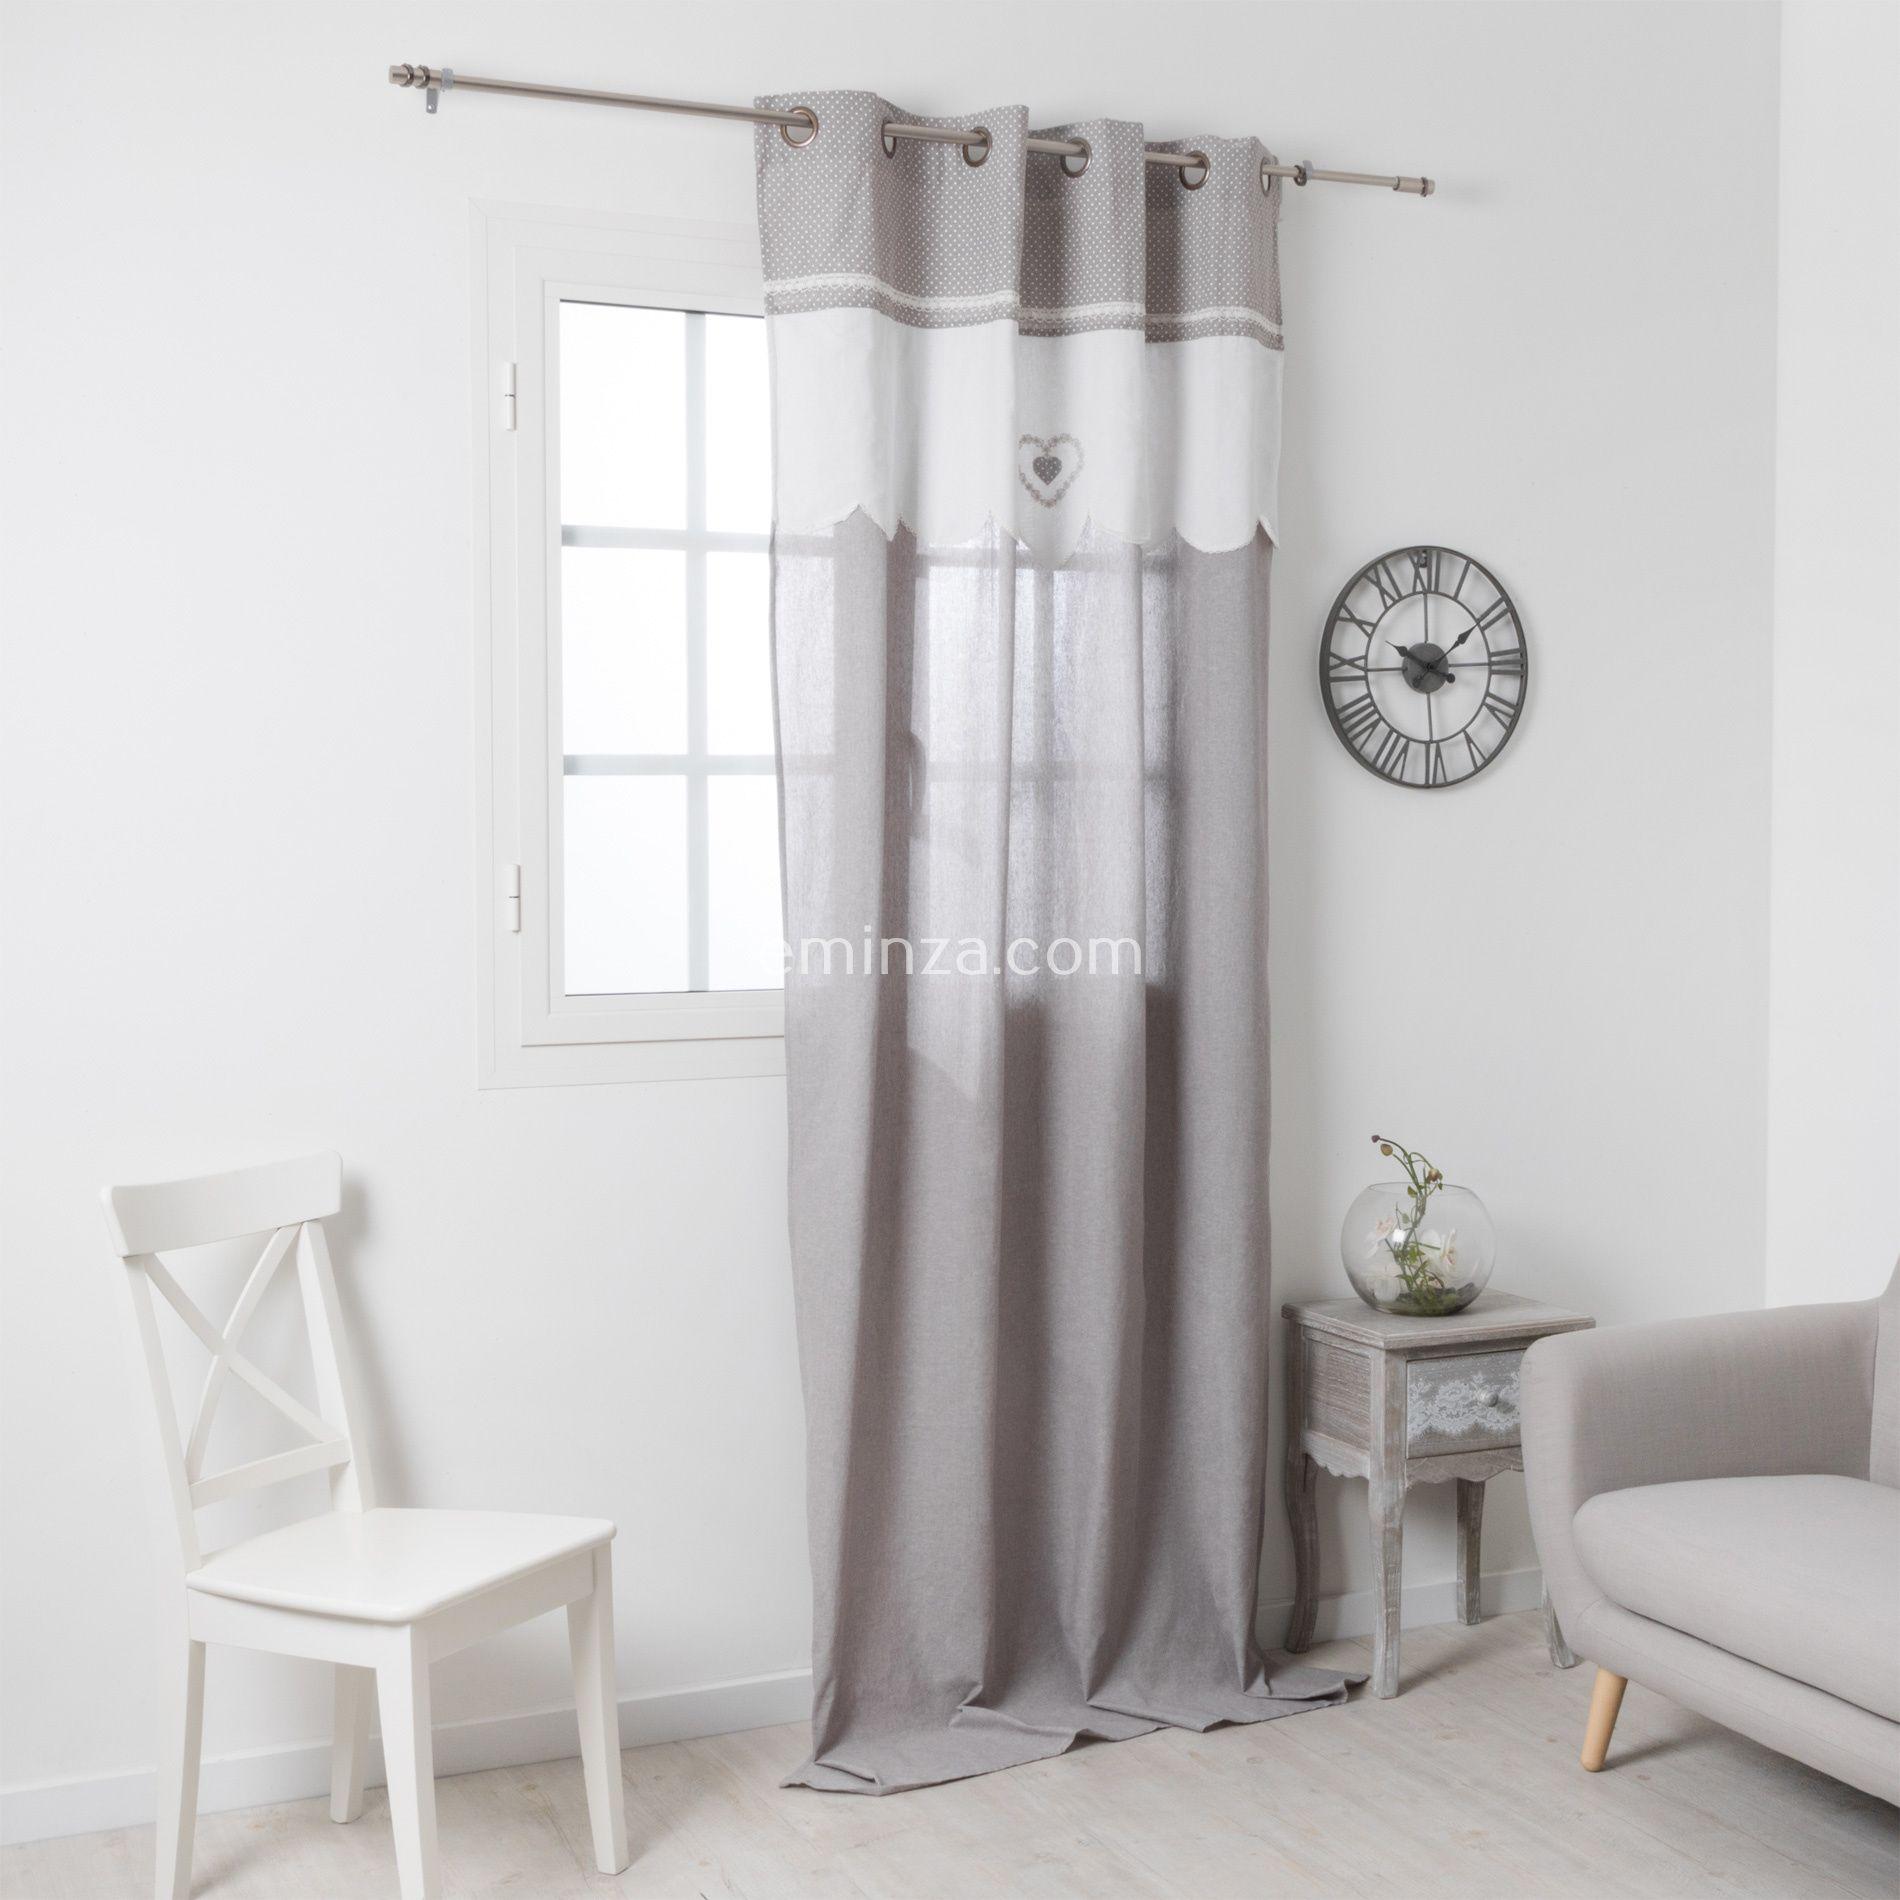 Rideau tamisant 135 x h260 cm verone lin rideau tamisant eminza for Rideau maison